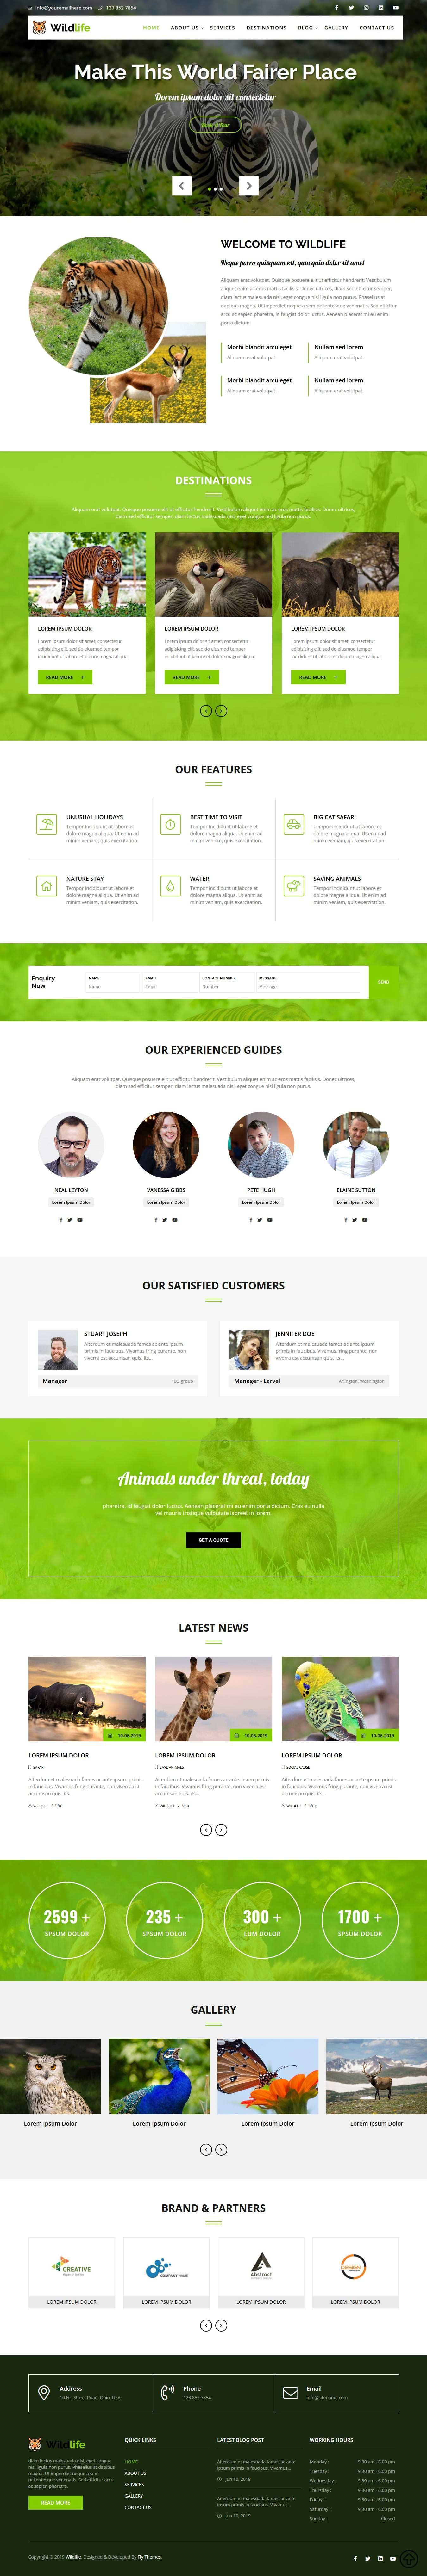 Professional WordPress Themes & Templates Download